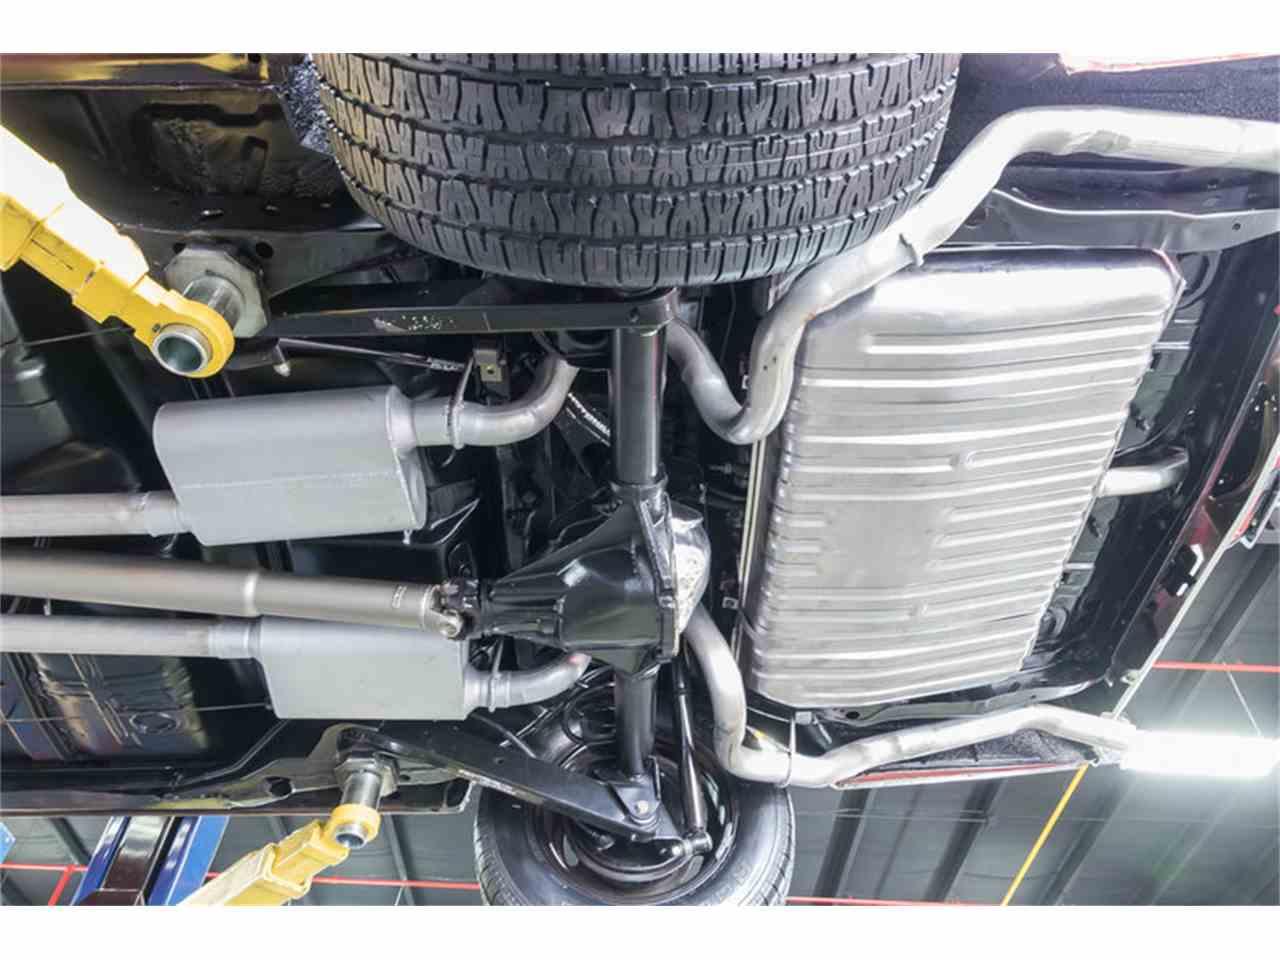 1971 chevrolet monte carlo for sale cc for Vanguard motors plymouth michigan